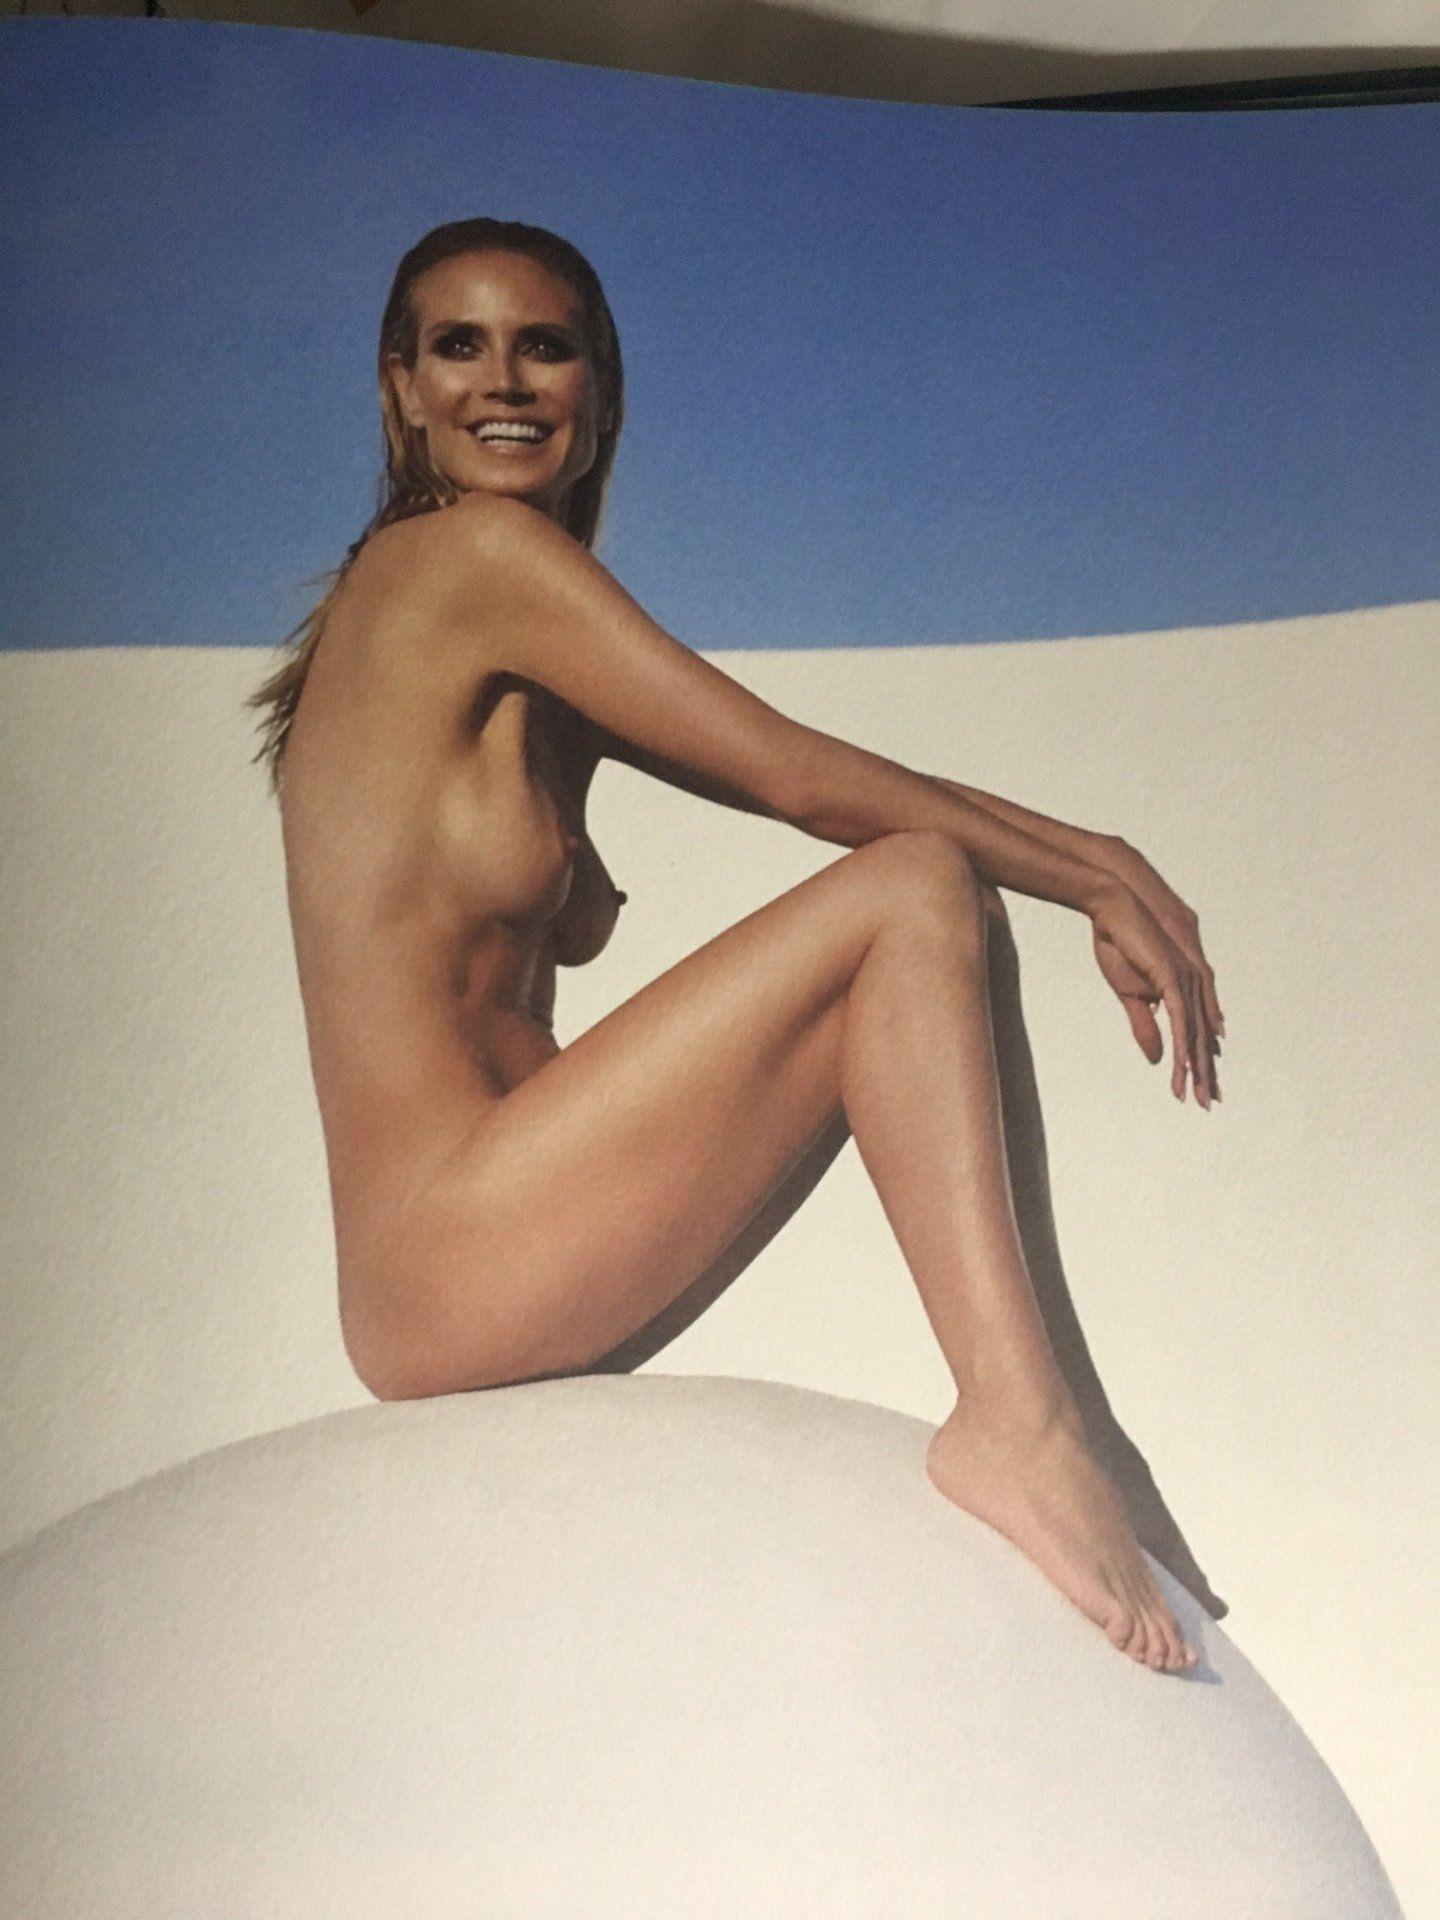 Fappening Heidi Klum nude (94 photos), Sexy, Bikini, Boobs, panties 2020